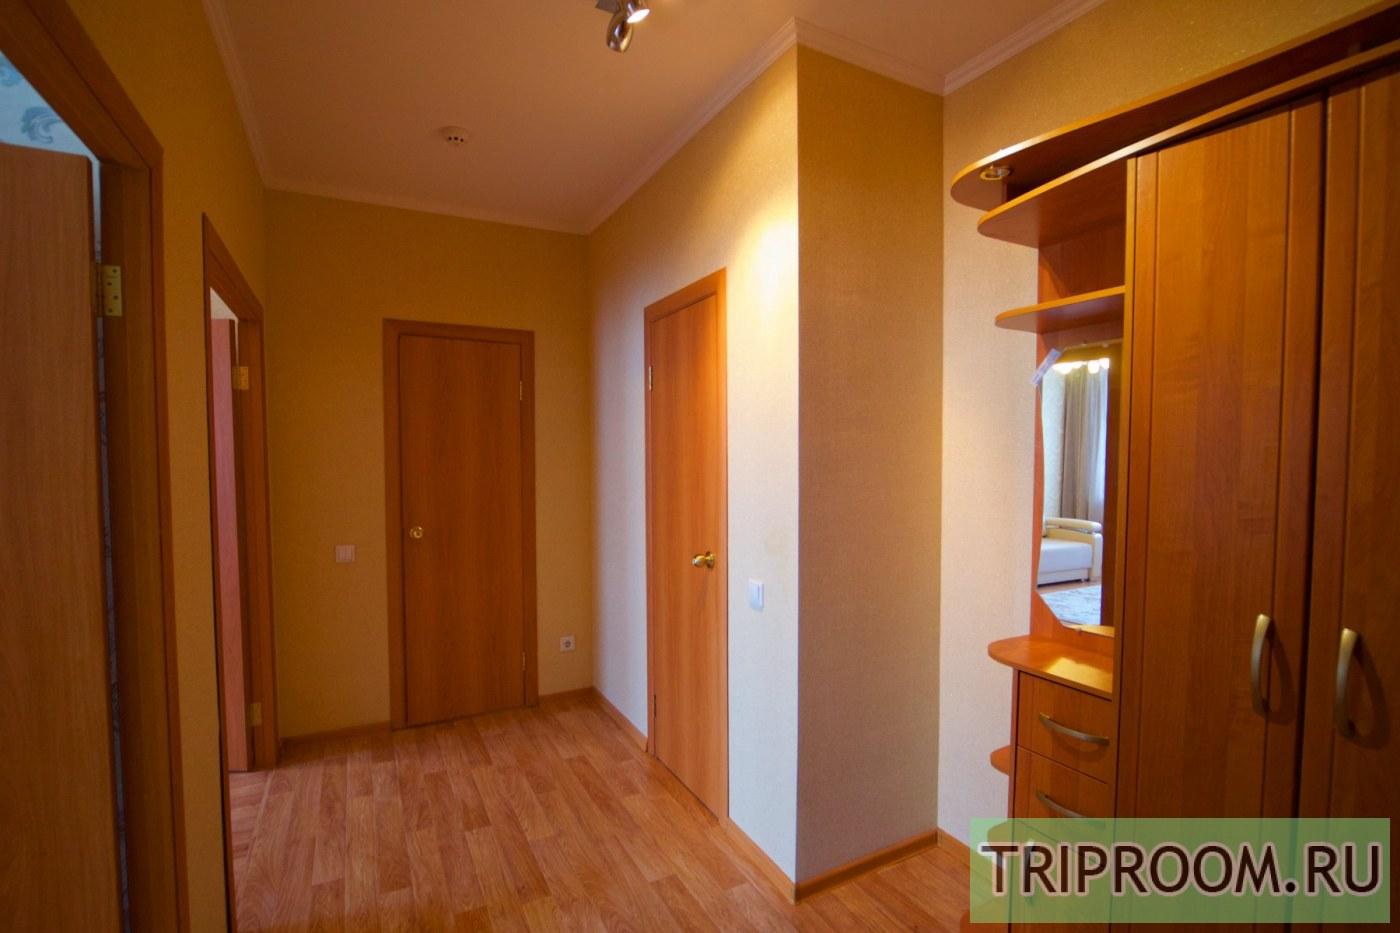 1-комнатная квартира посуточно (вариант № 40369), ул. Алексеева улица, фото № 7